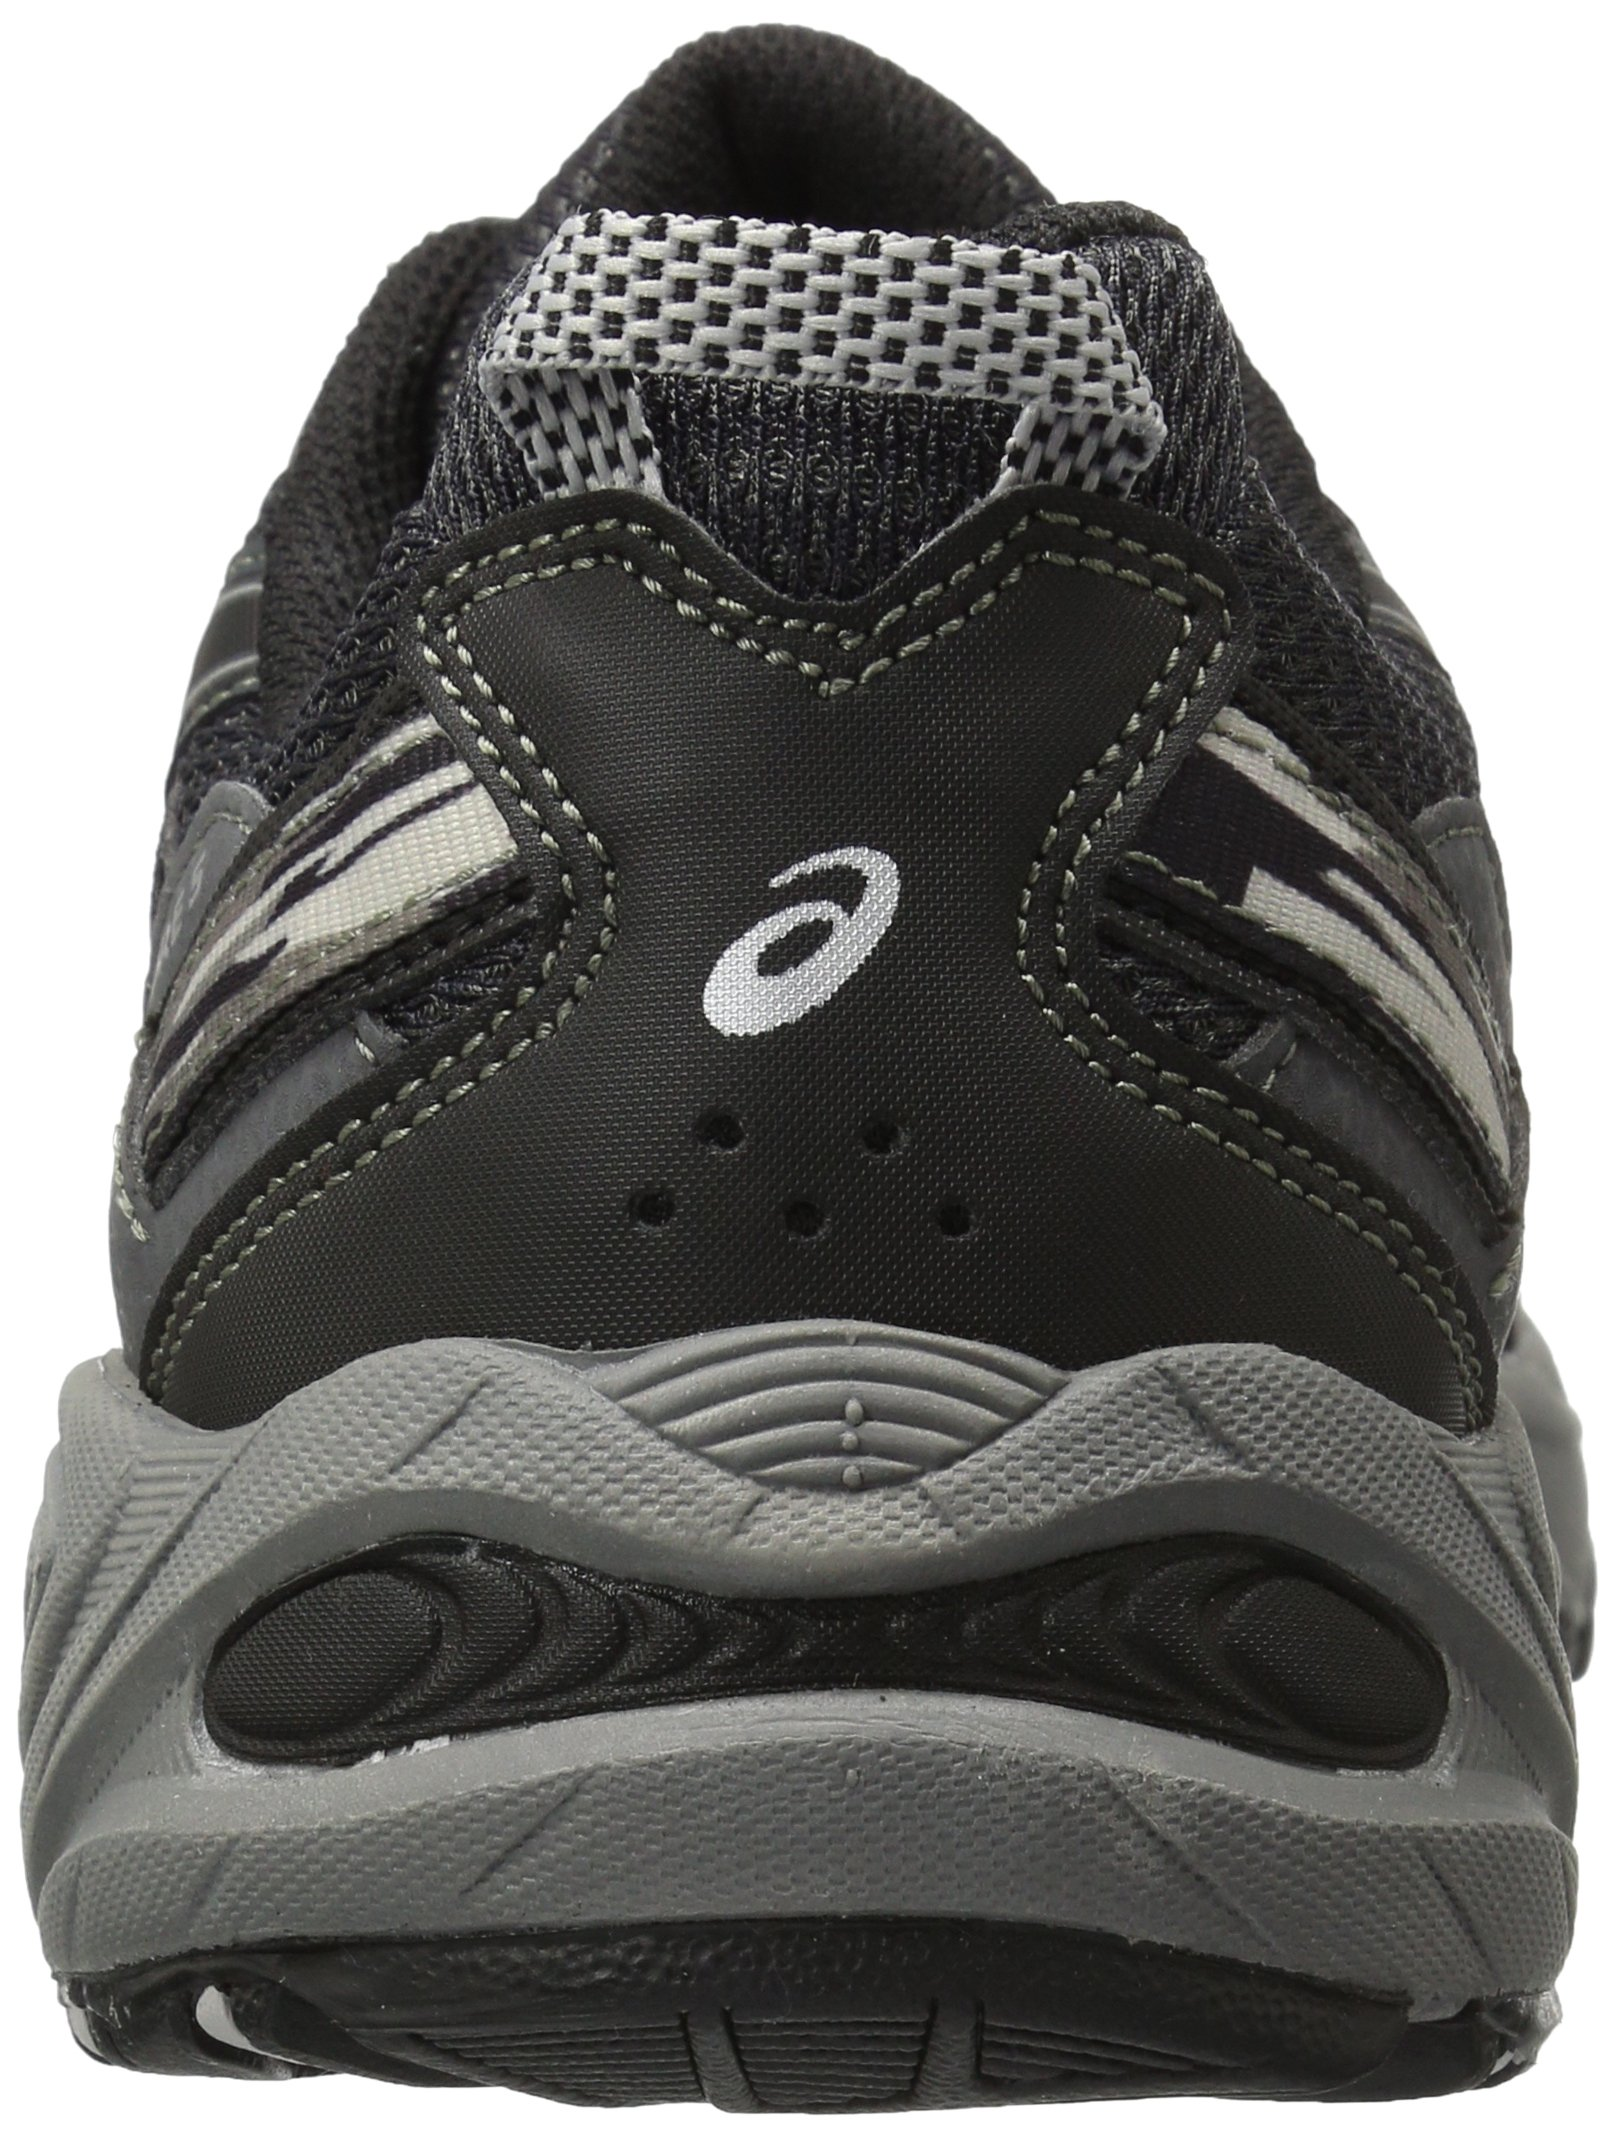 ASICS Men's Gel-Venture 5-M, Black/Onyx/Charcoal, 8 M US by ASICS (Image #2)